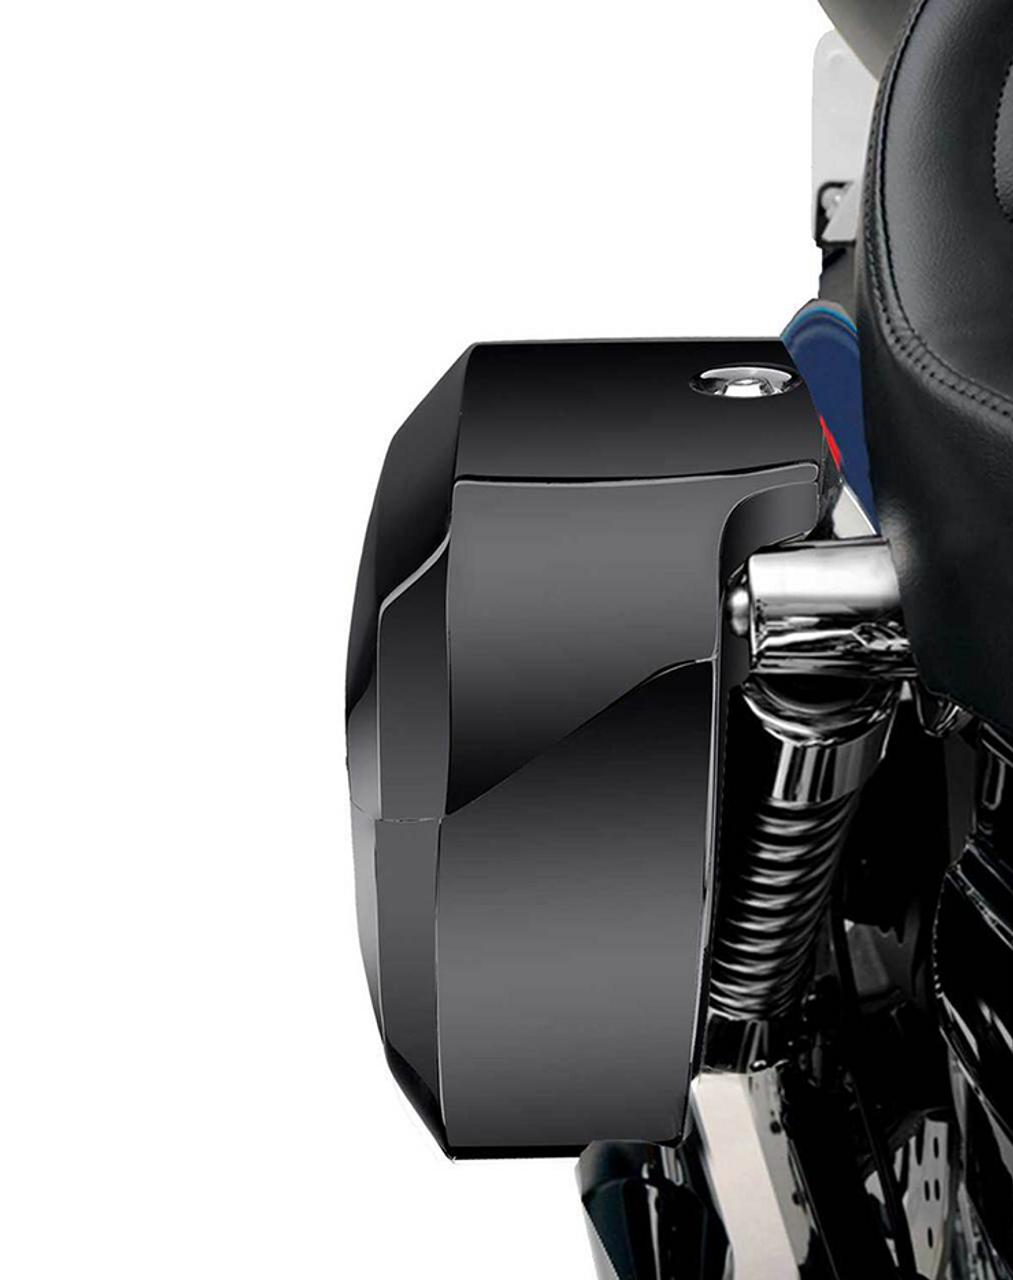 Kawasaki Eliminator 125, BN125 Viking Lamellar Large Spear Shock Cutout Hard Saddlebags Shock Cutout View